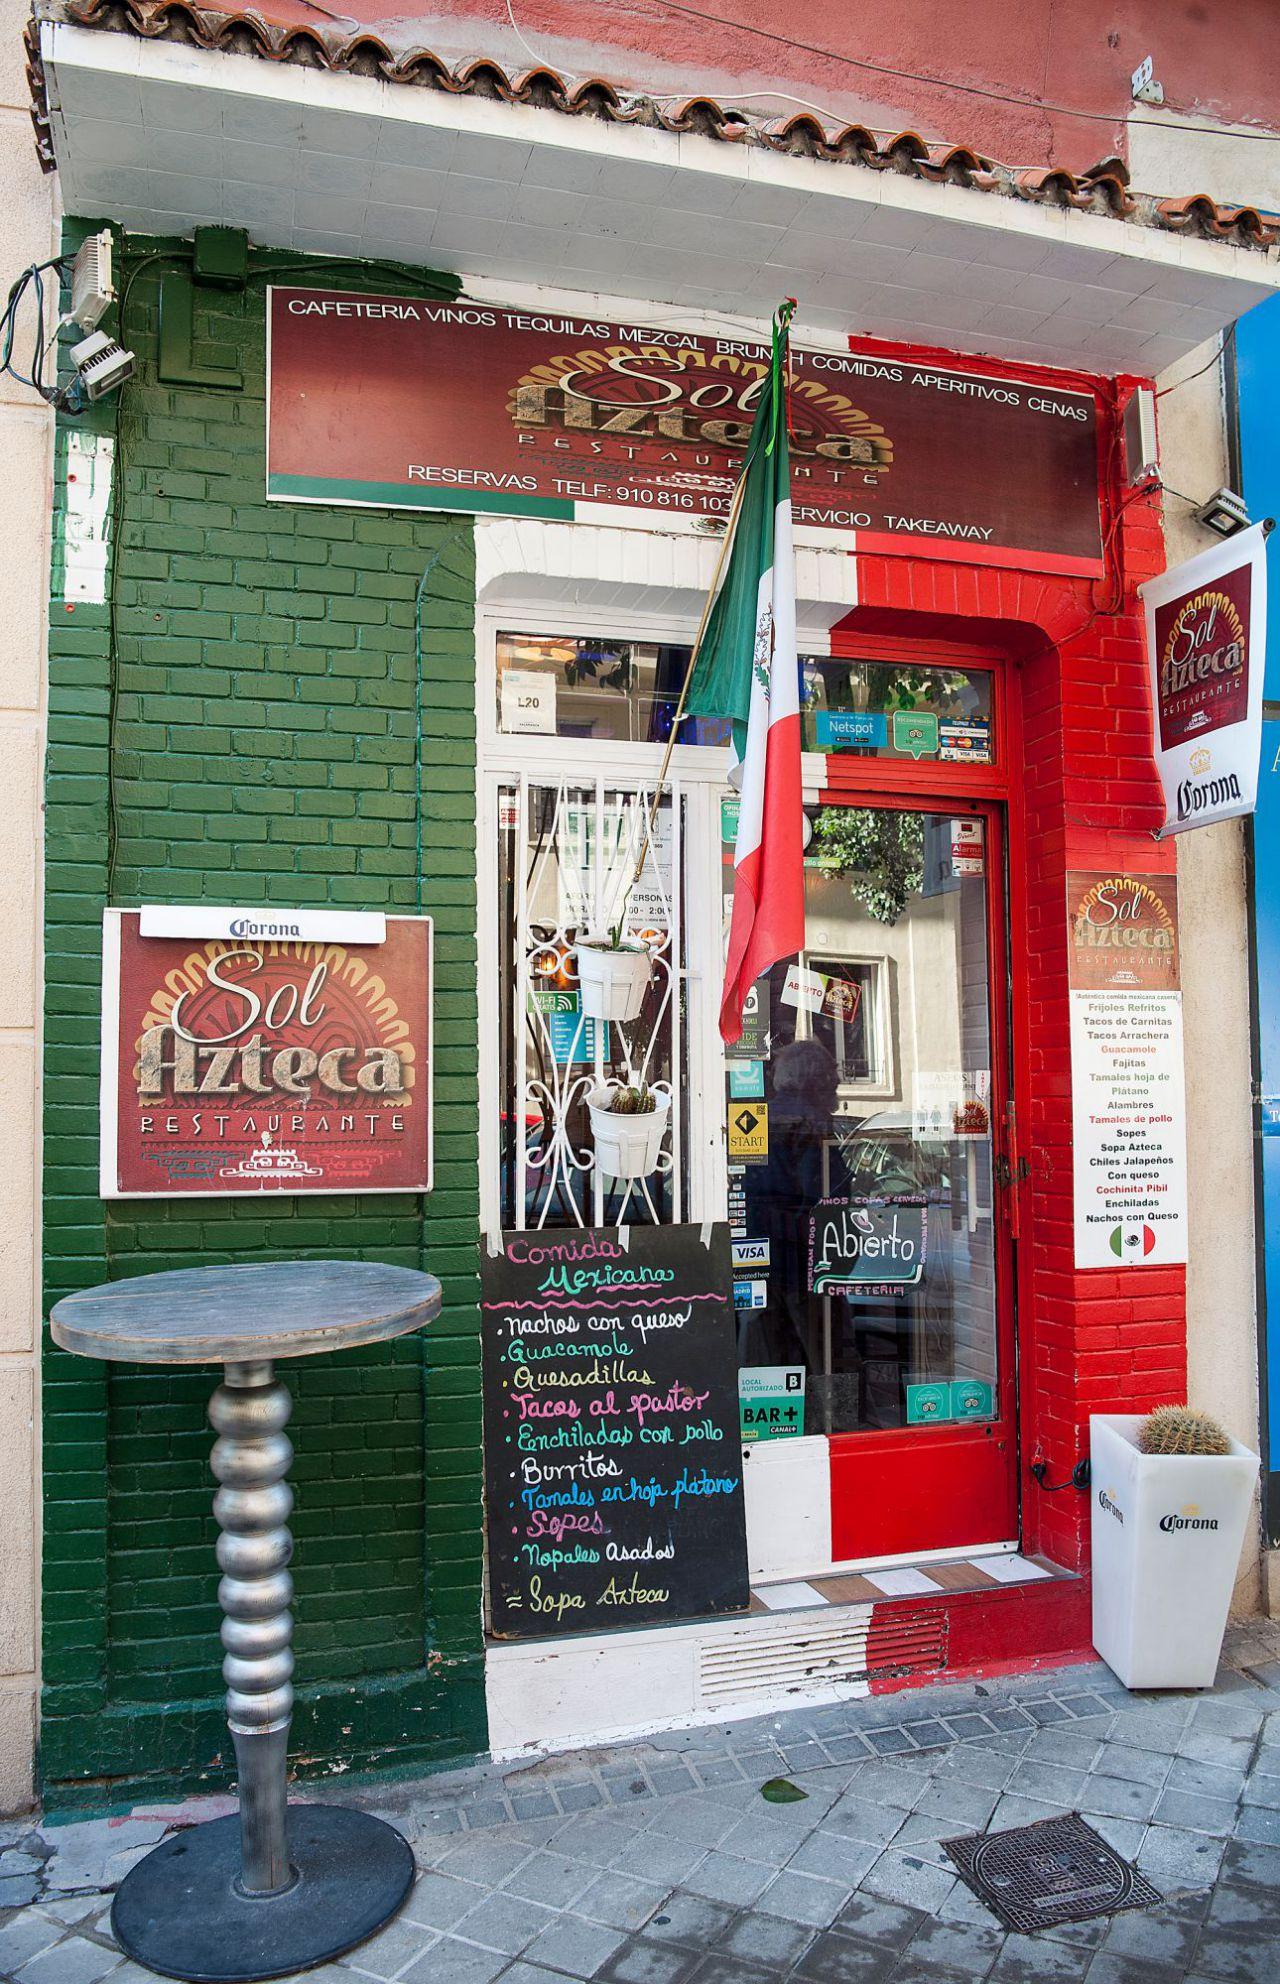 Nº 61. Restaurante Sol Ateca.  www.solazteca.es  Tlf. 910 81 61 03